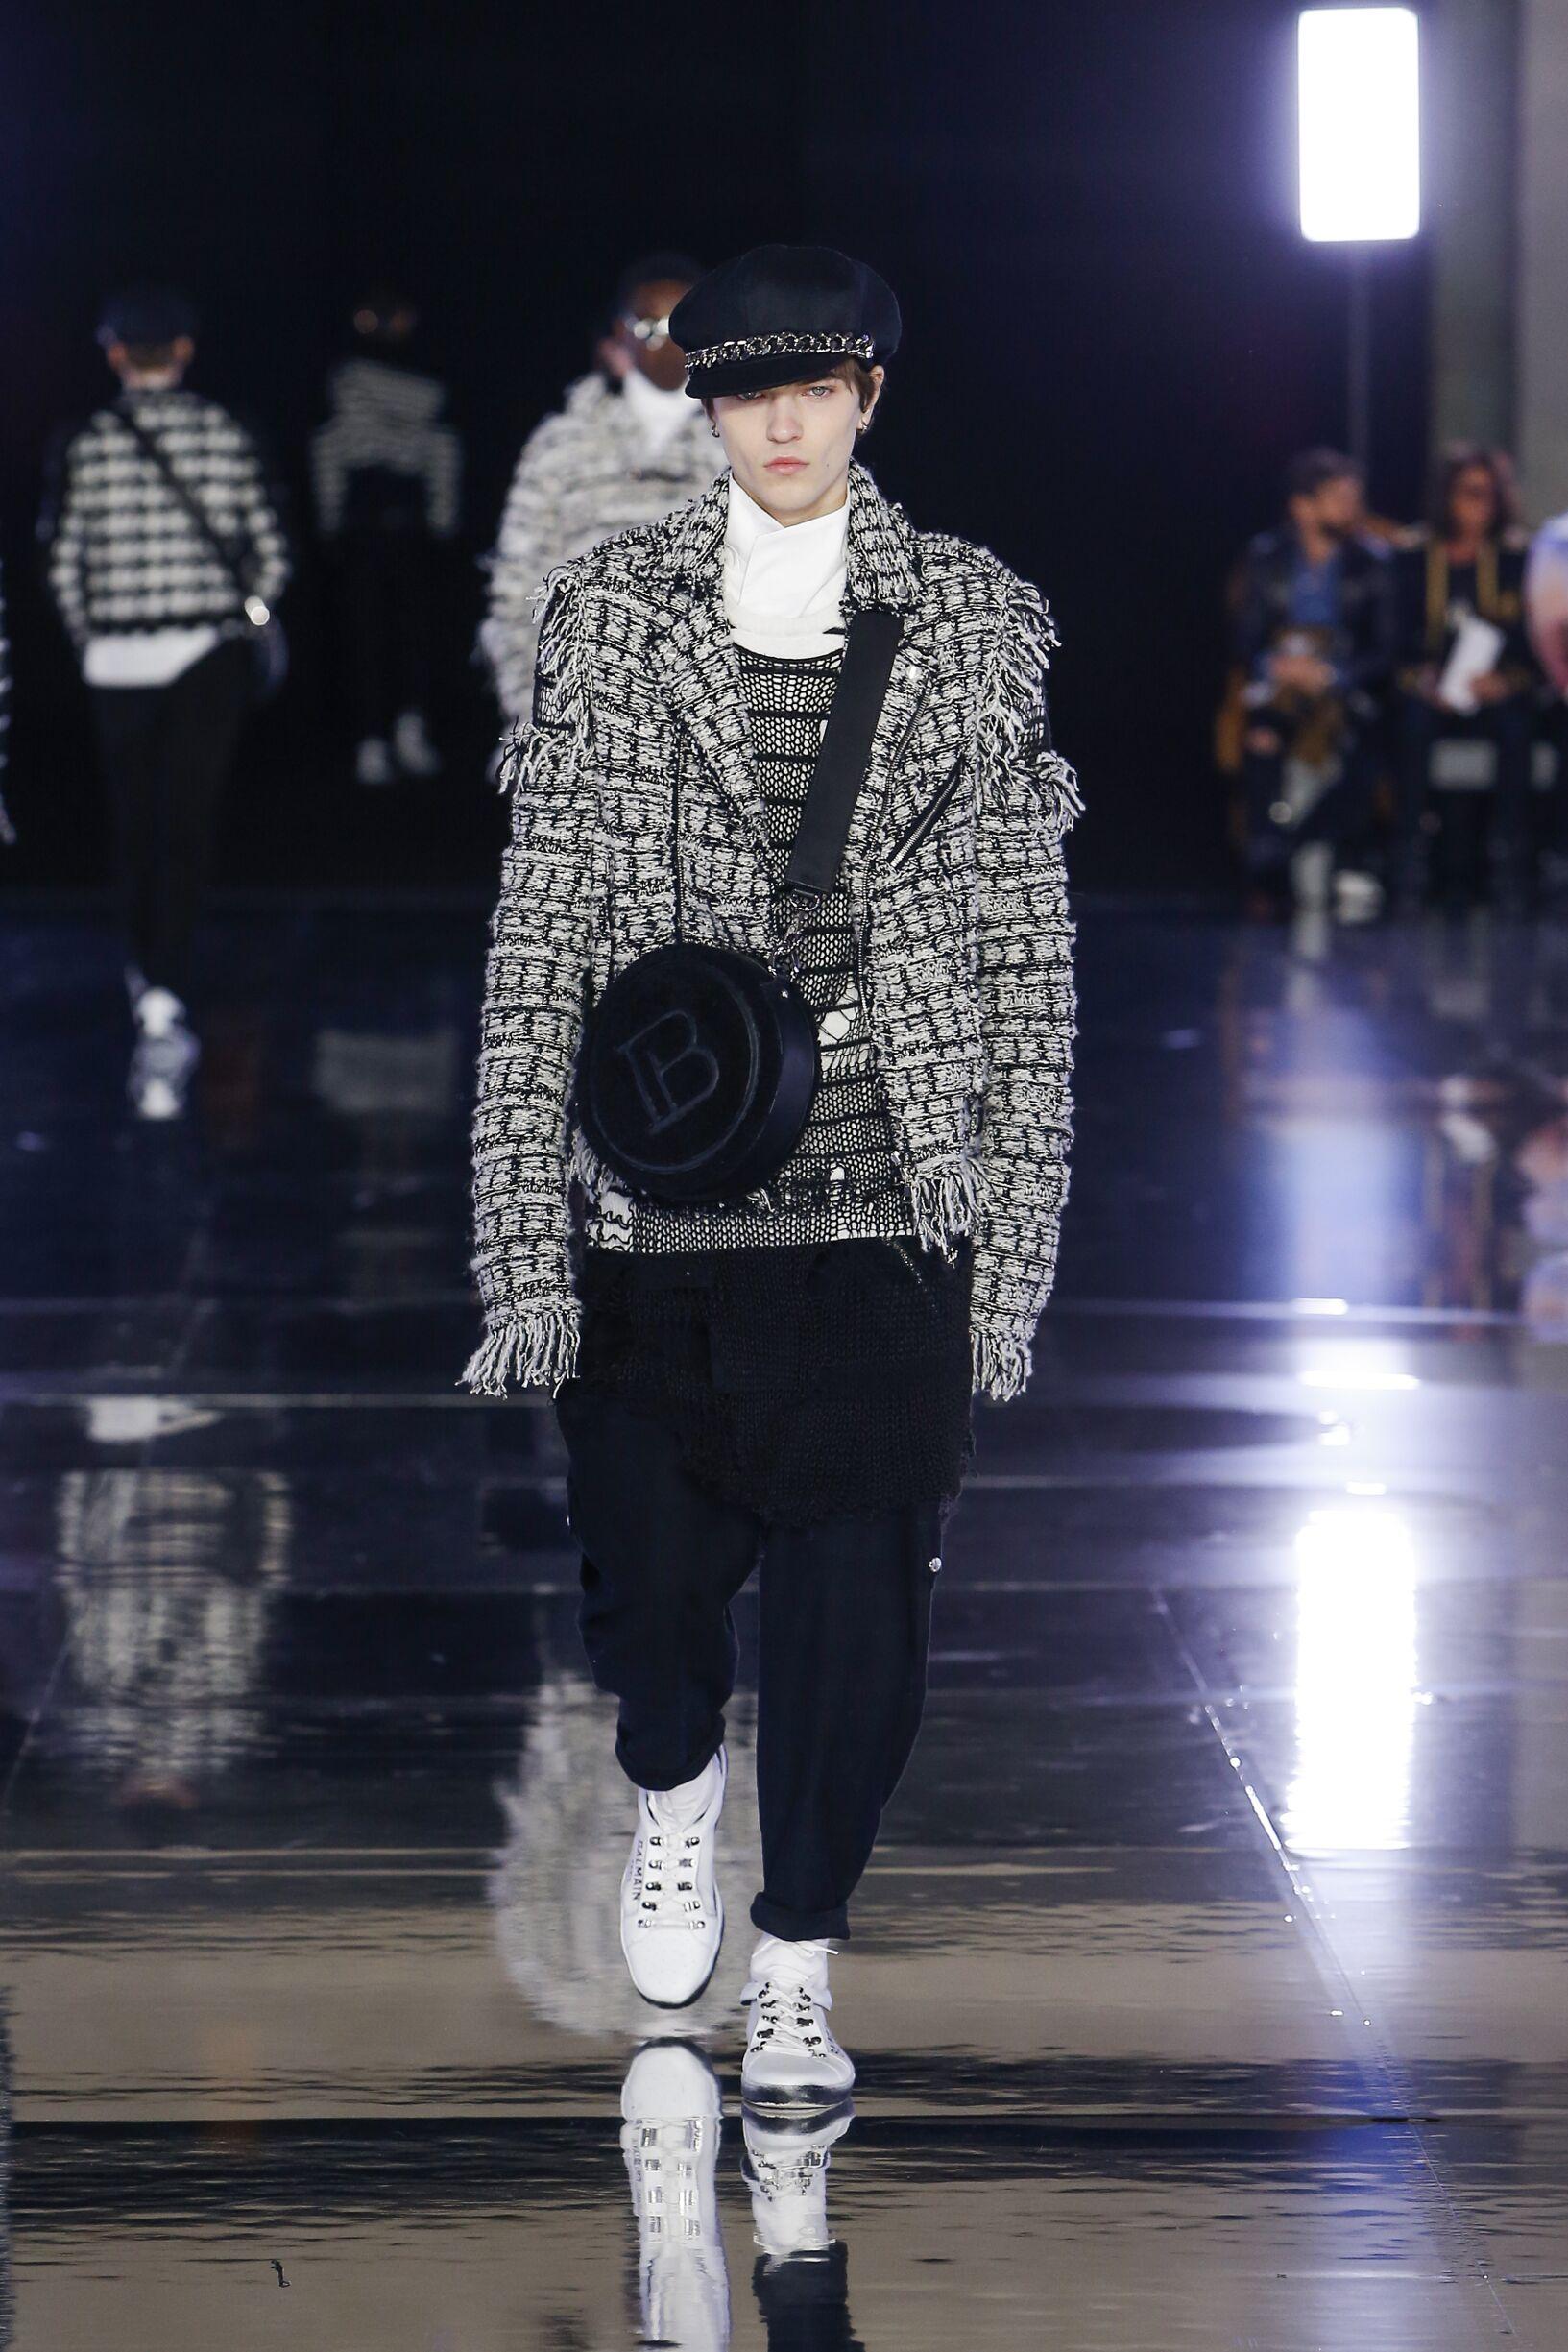 Fall Fashion Trends 2019-20 Balmain